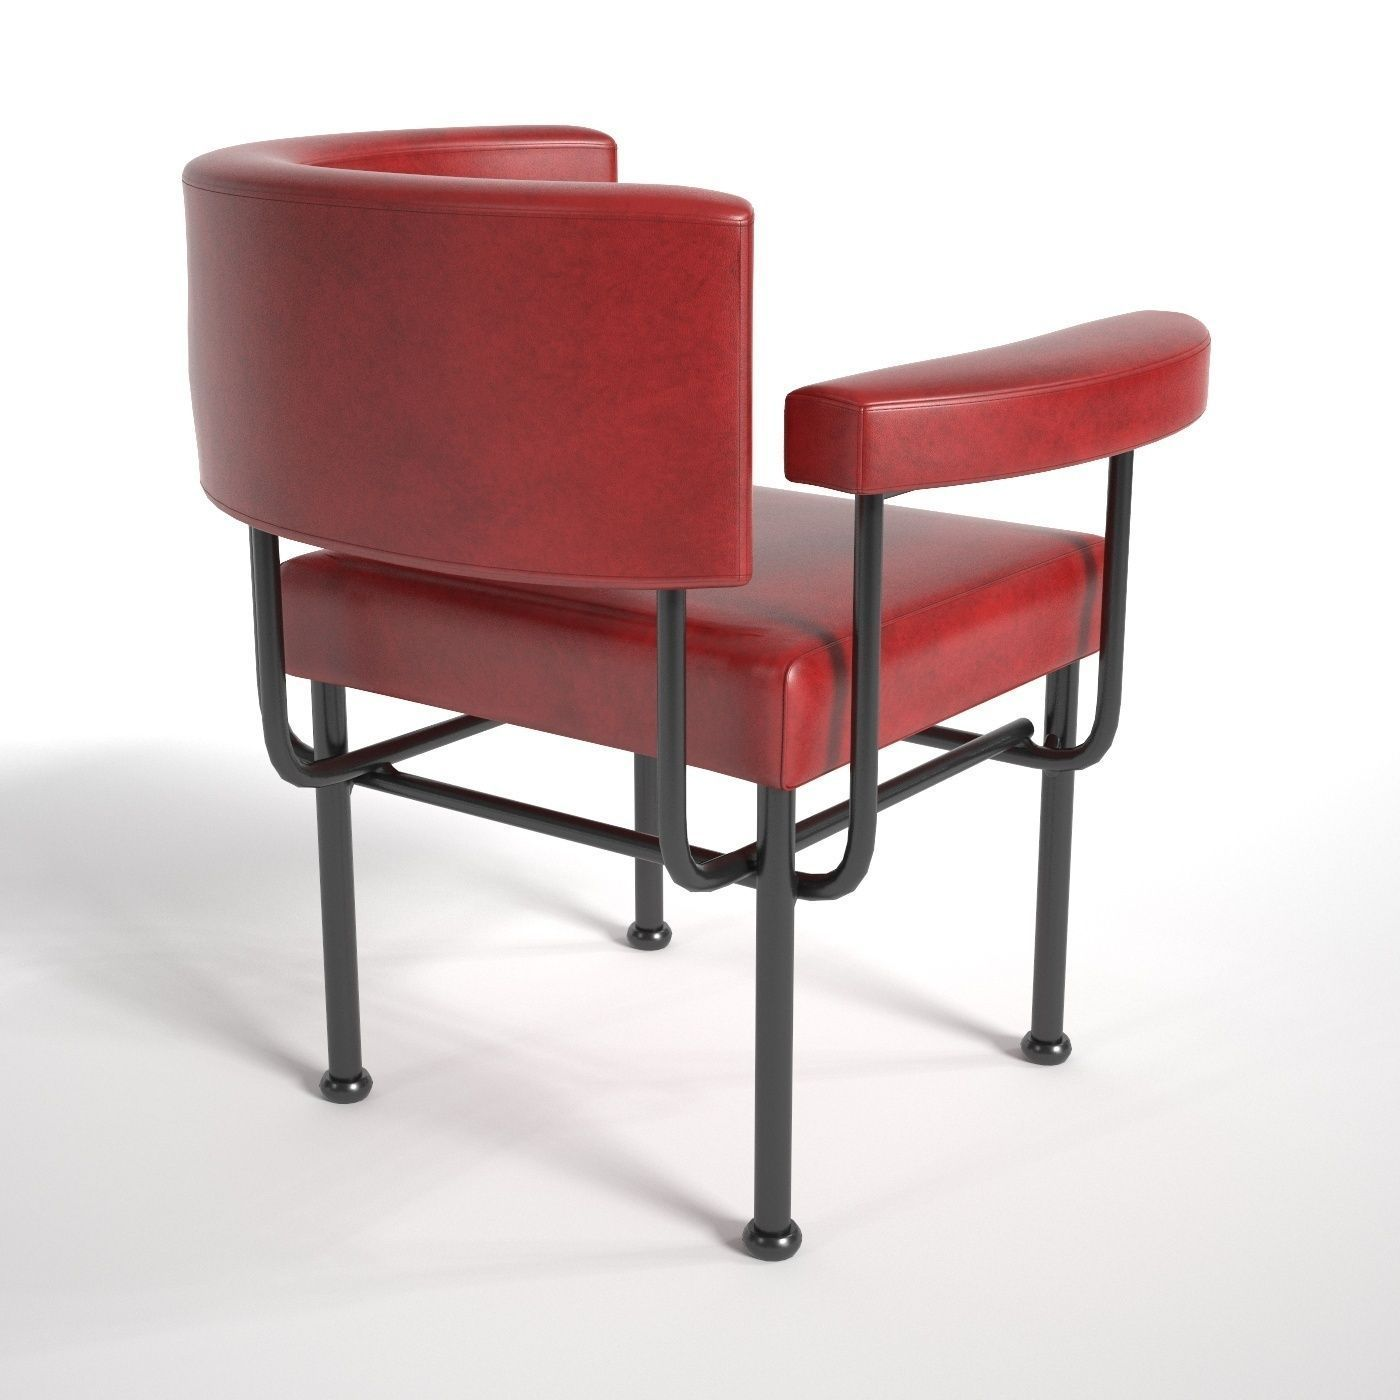 Stellar Works Cotton Club Chair 3D